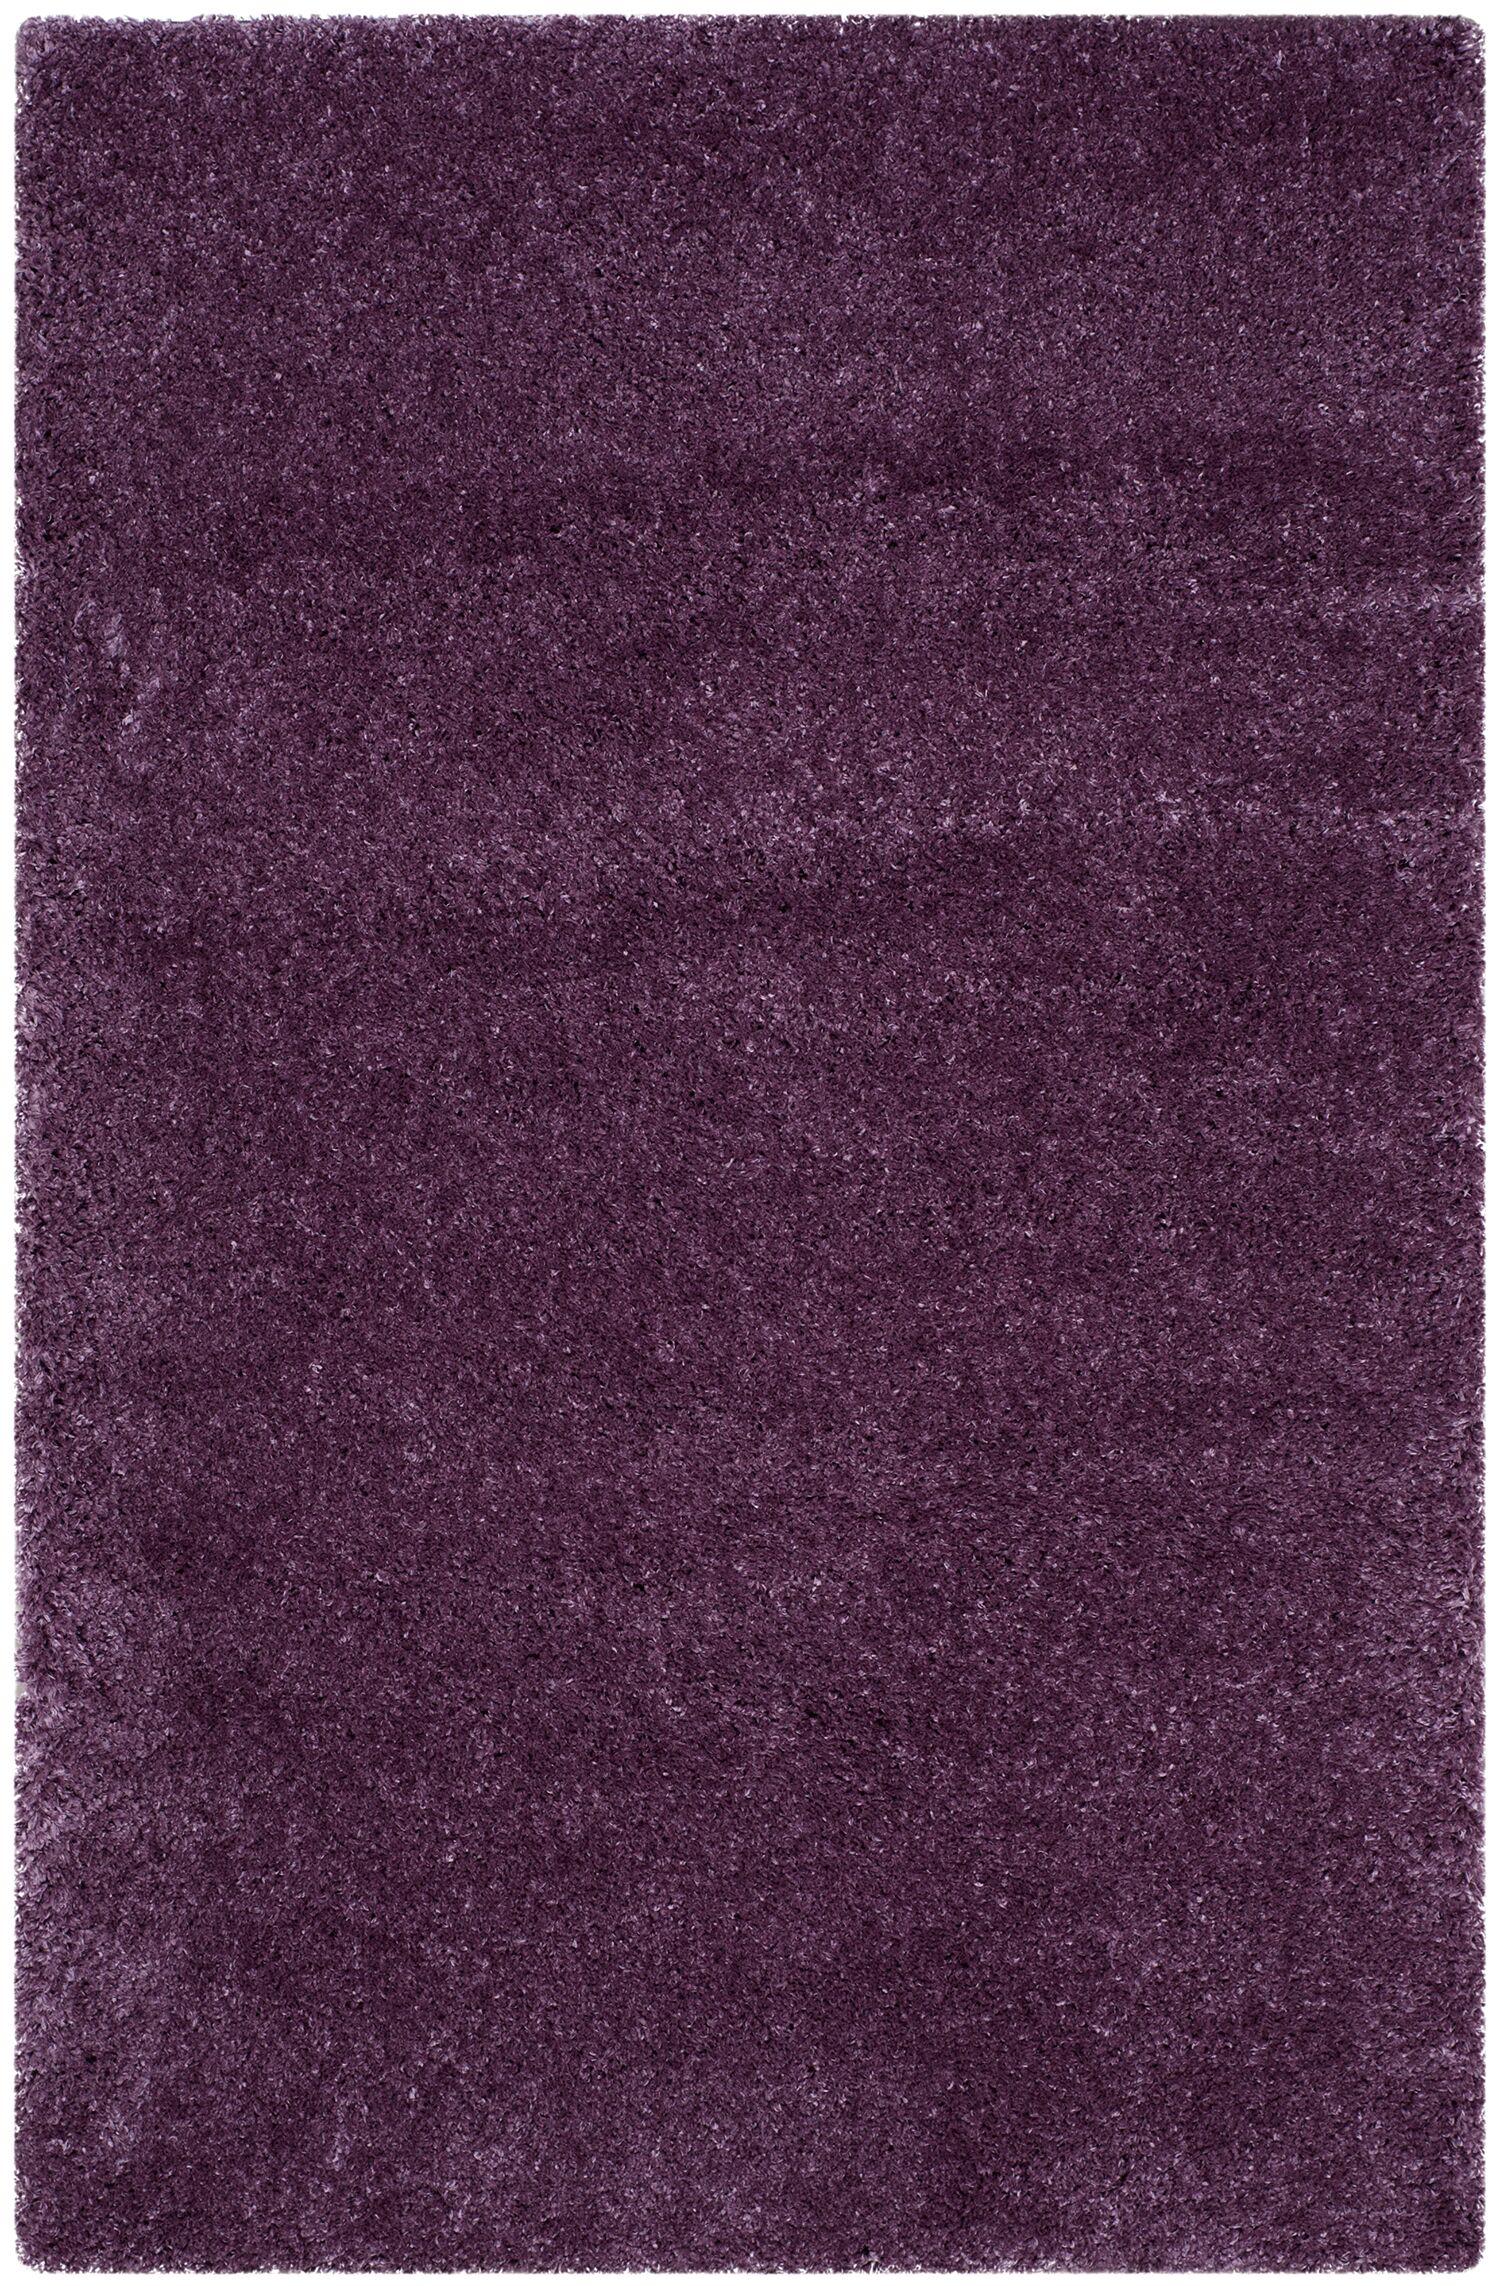 Slayton Purple Area Rug Rug Size: Rectangle 4' x 6'